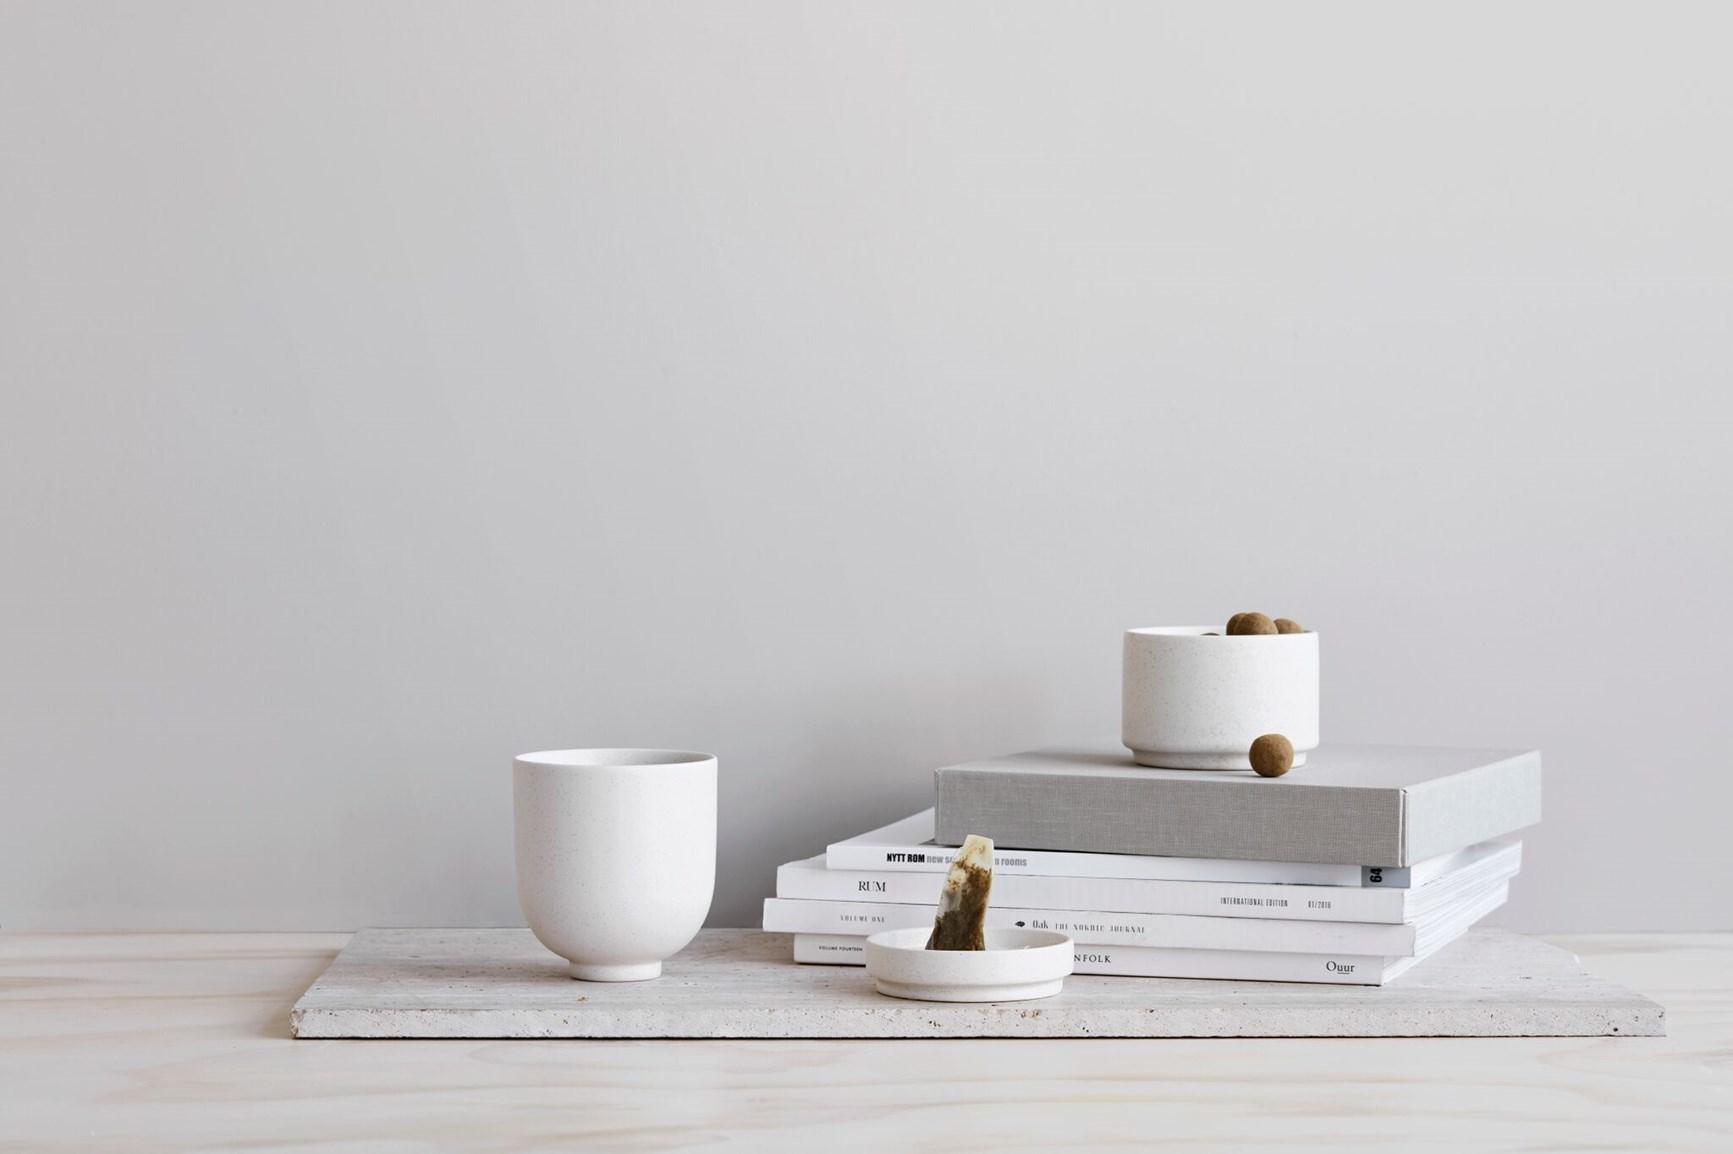 Nordic Minimalist Collection by Kristina Dam